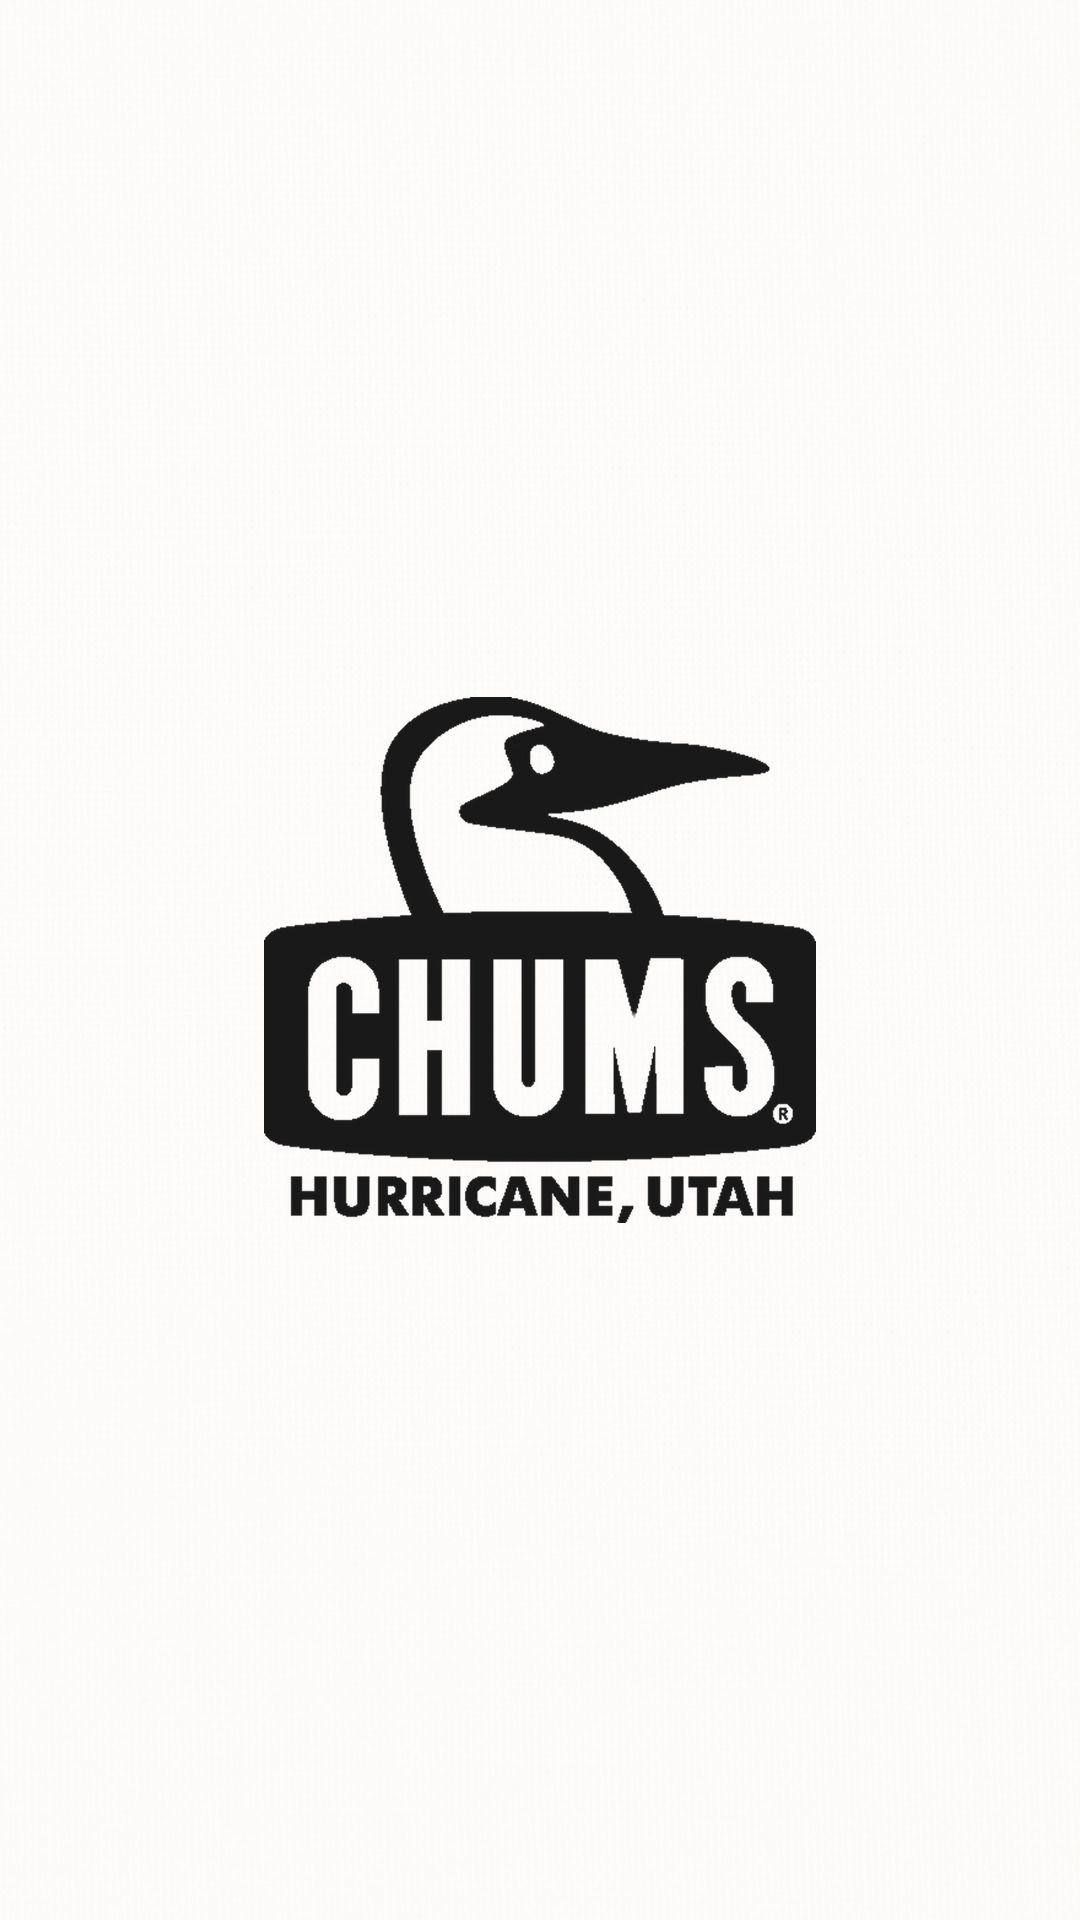 Chums42 キャンプ イラスト チャムス ステッカー 鳥のロゴ